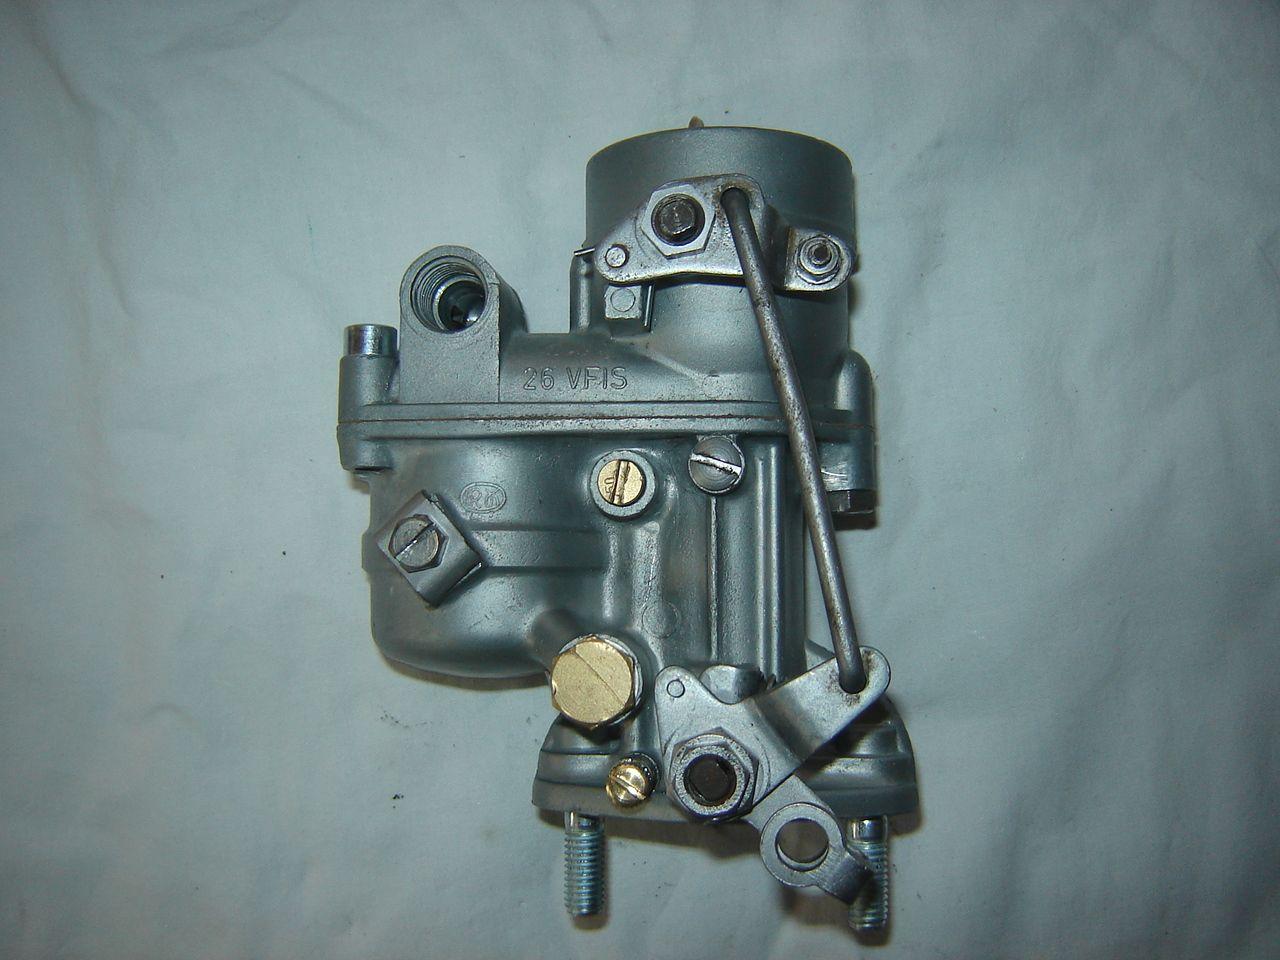 Solex 26 Vfis Vergaser Revidert Vw Kfer 1200 Ford Taunus 12m Velosolex Wiring Diagram